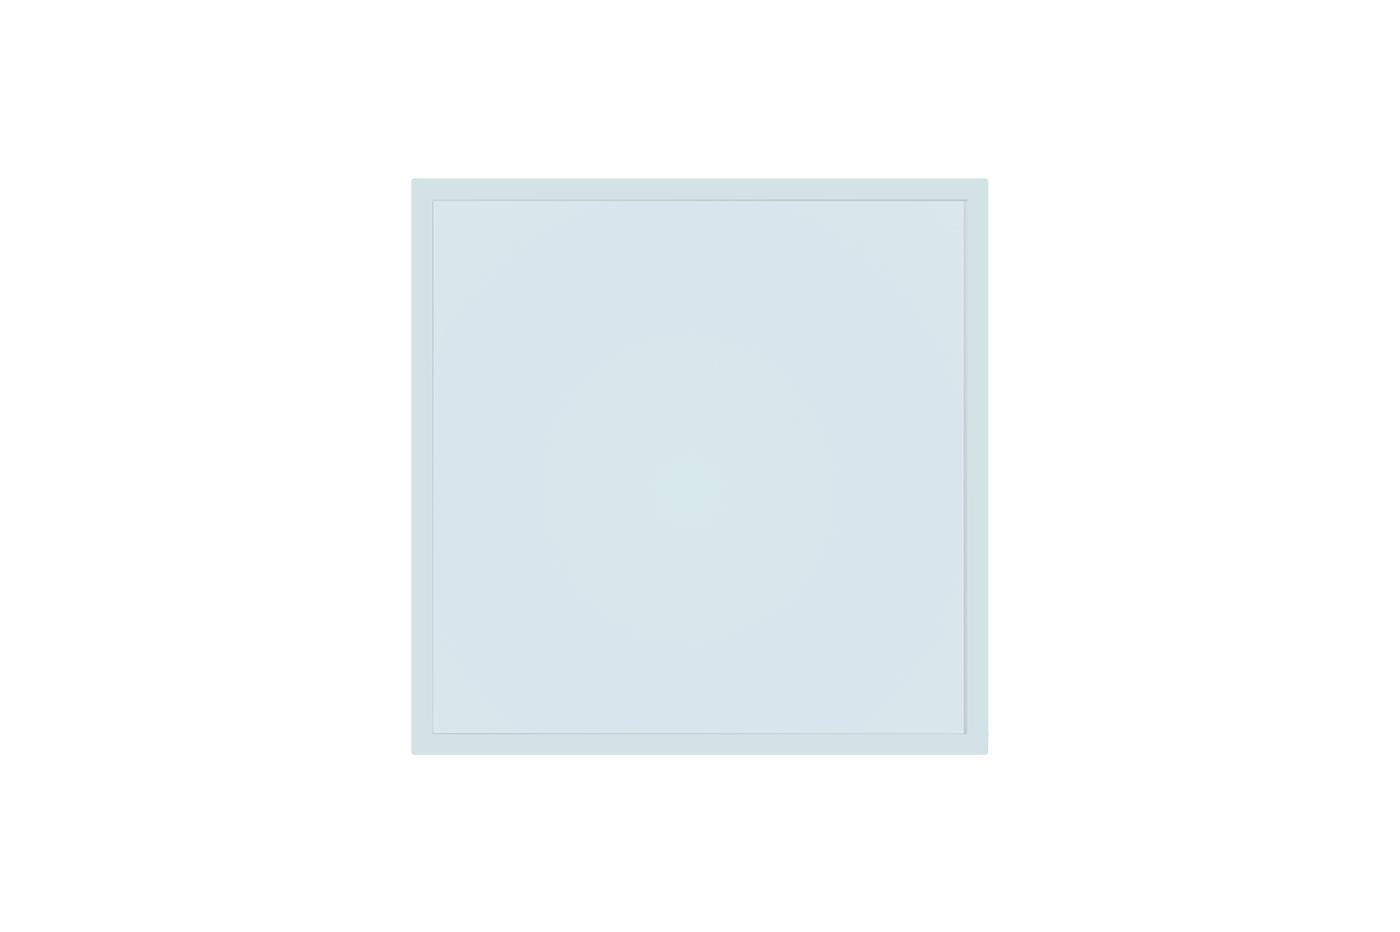 Plafoniera Led Quadrata 60x60 : Bes plafoniere beselettronica pannello led w